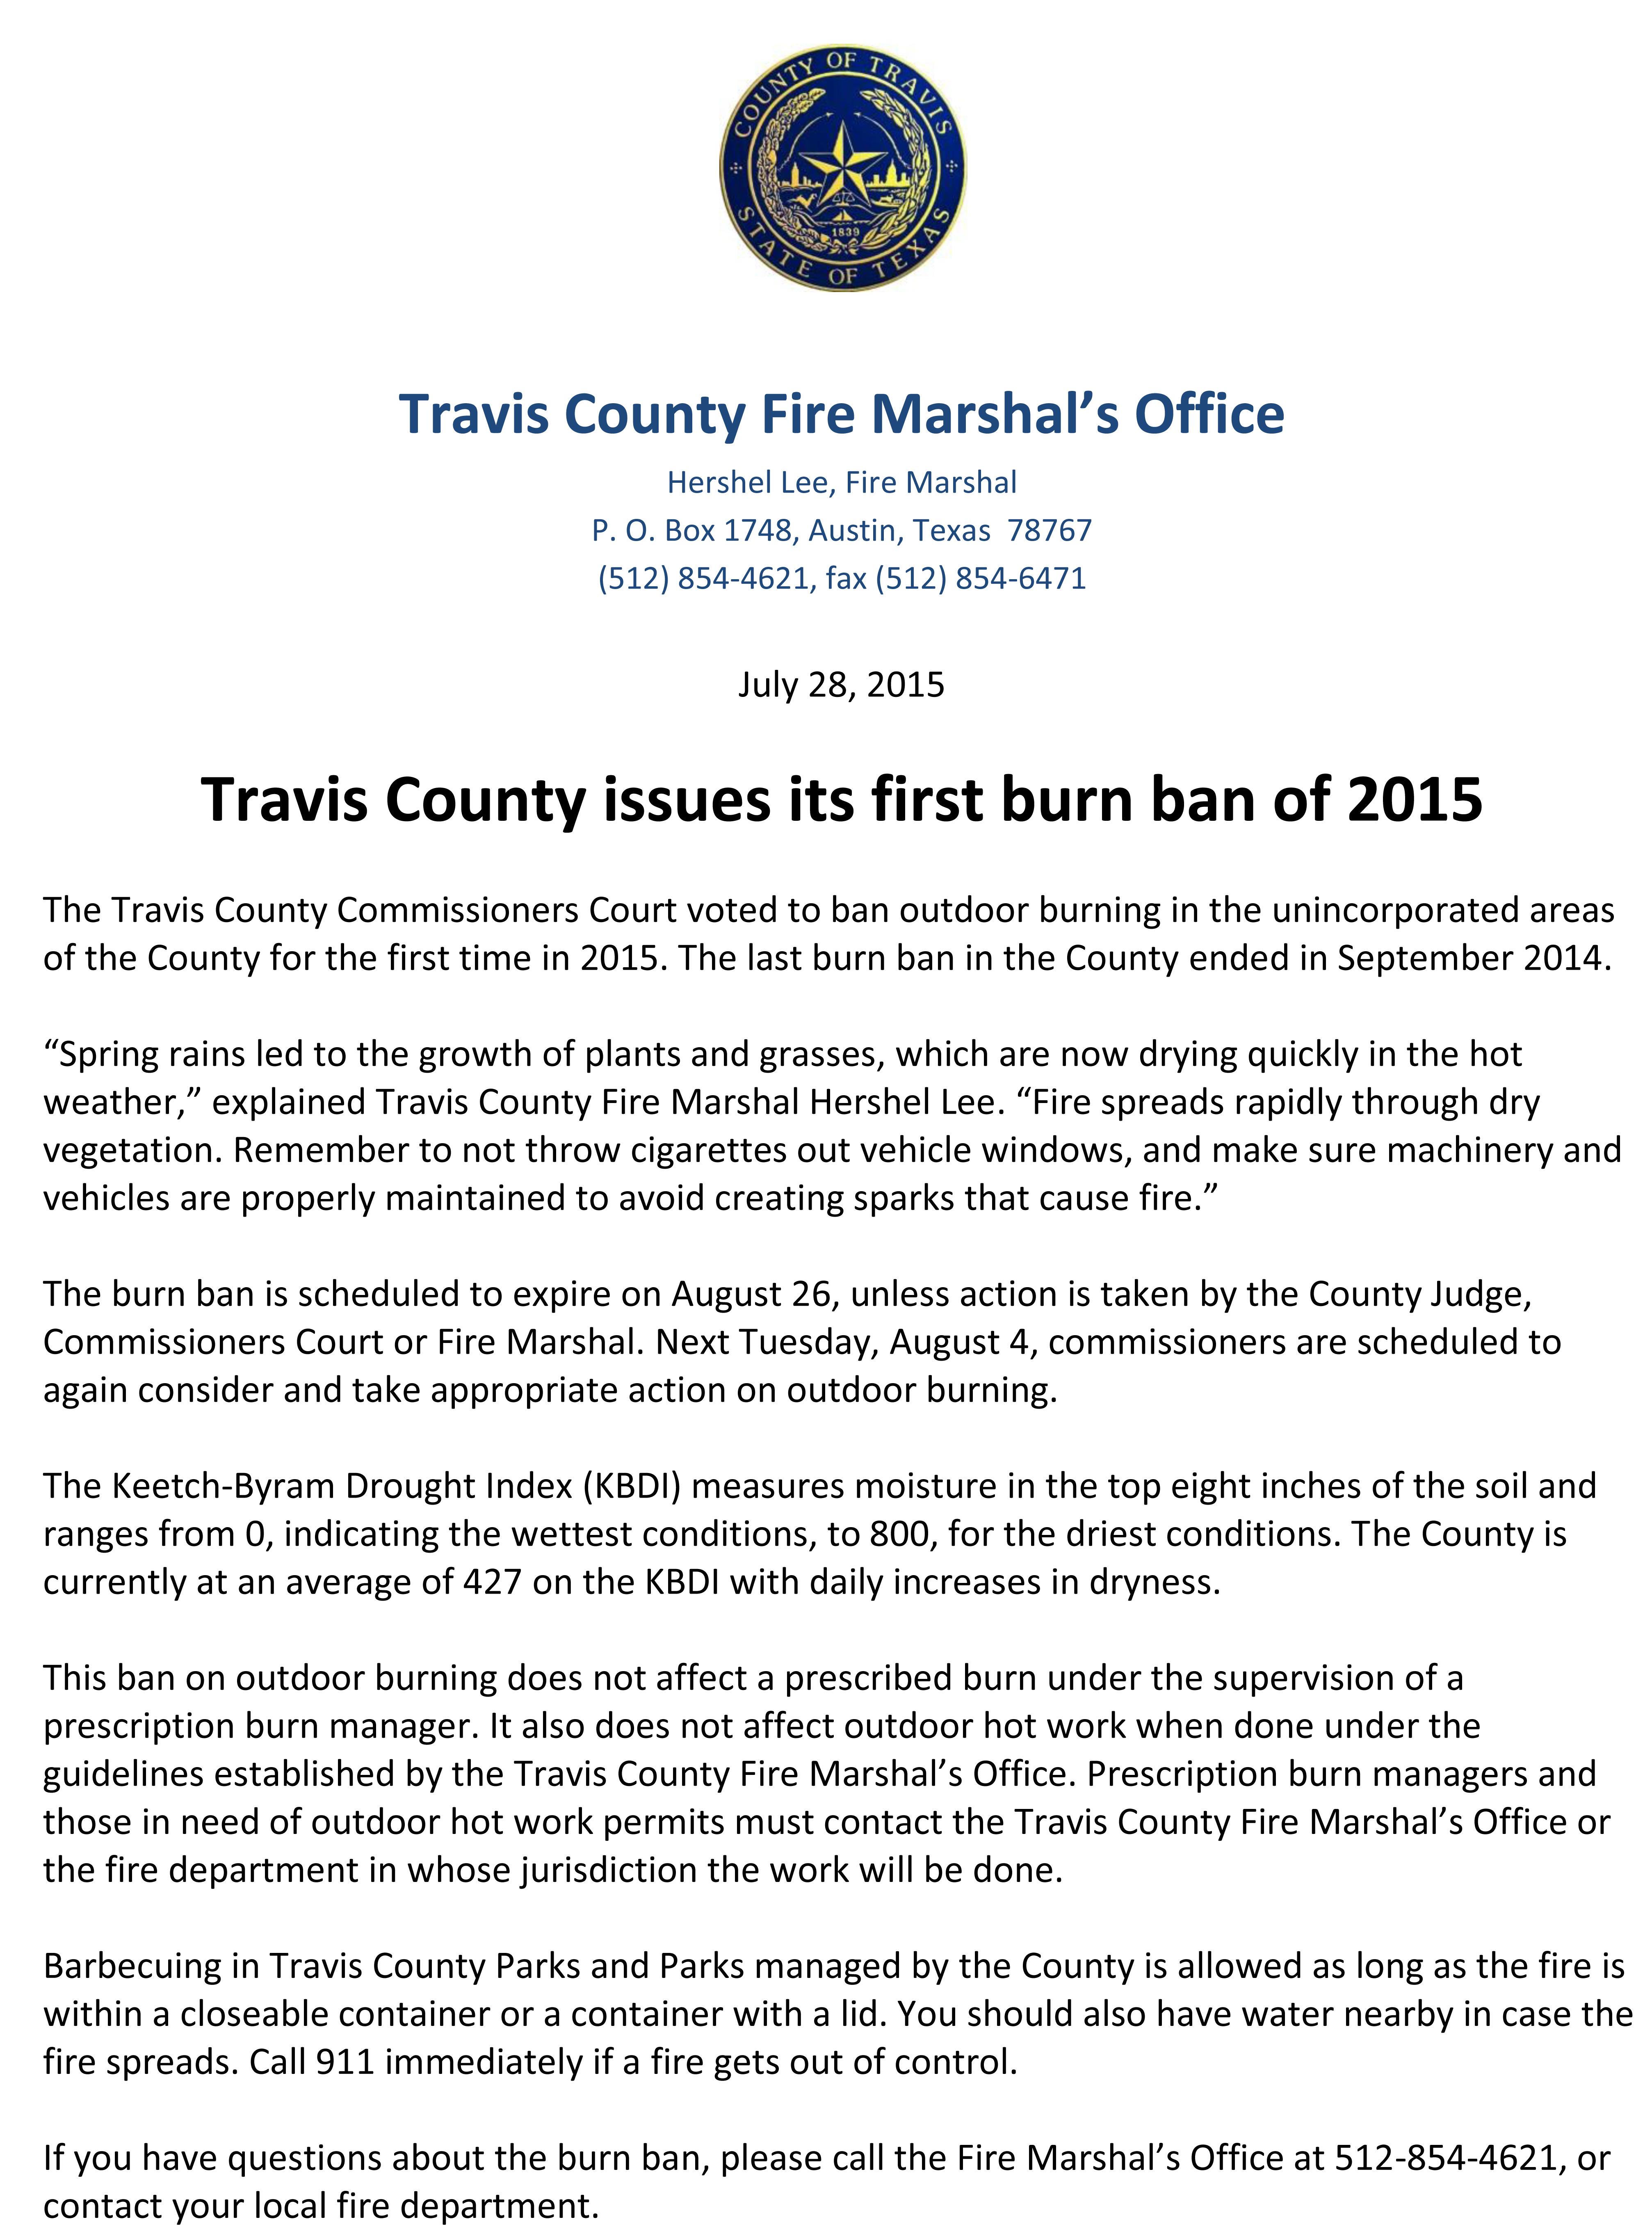 Fire_Marshal-Burn_ban-7-28-15 copy